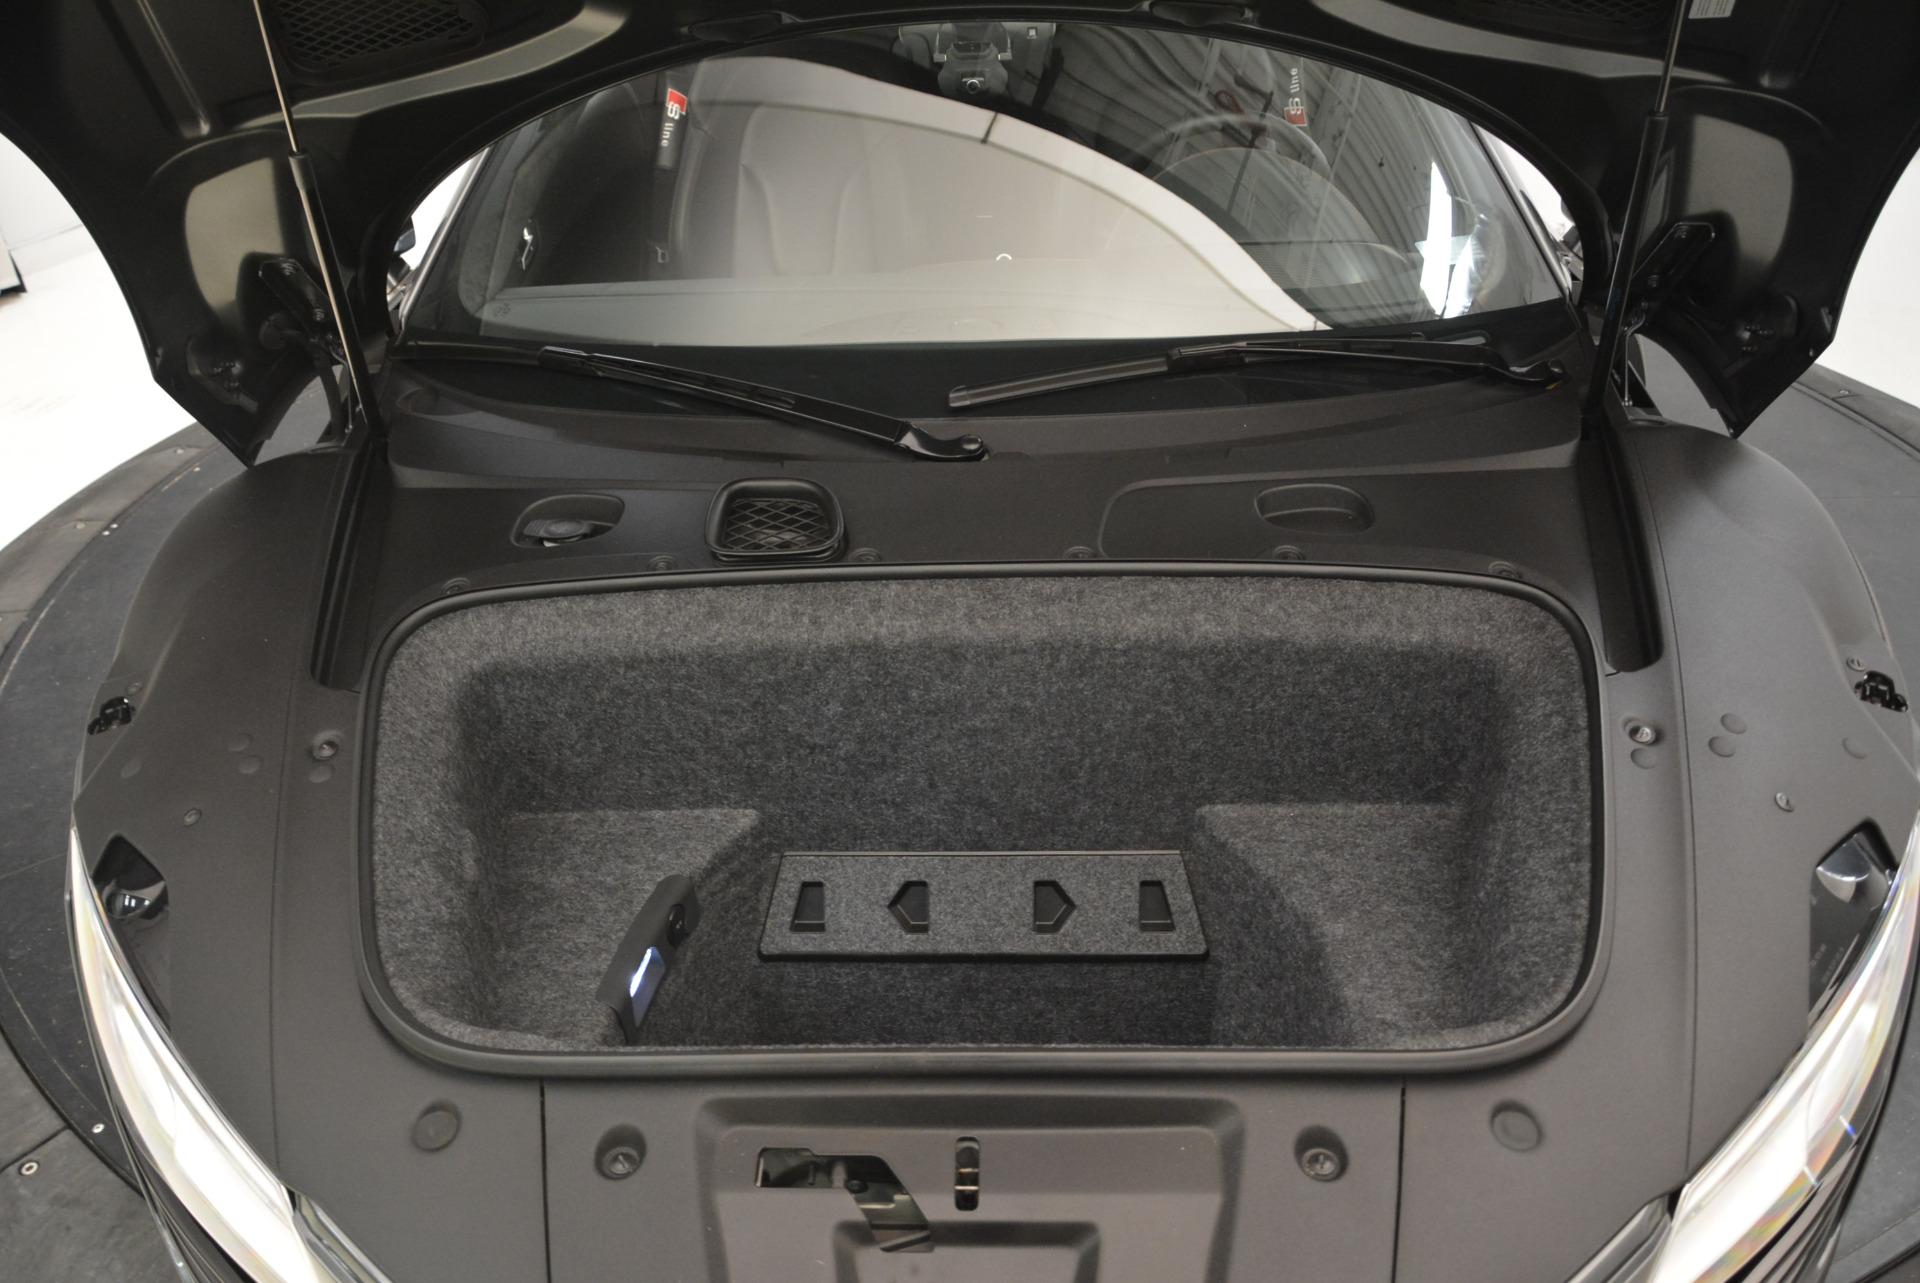 Used 2014 Audi R8 5.2 quattro For Sale In Greenwich, CT 2147_p27